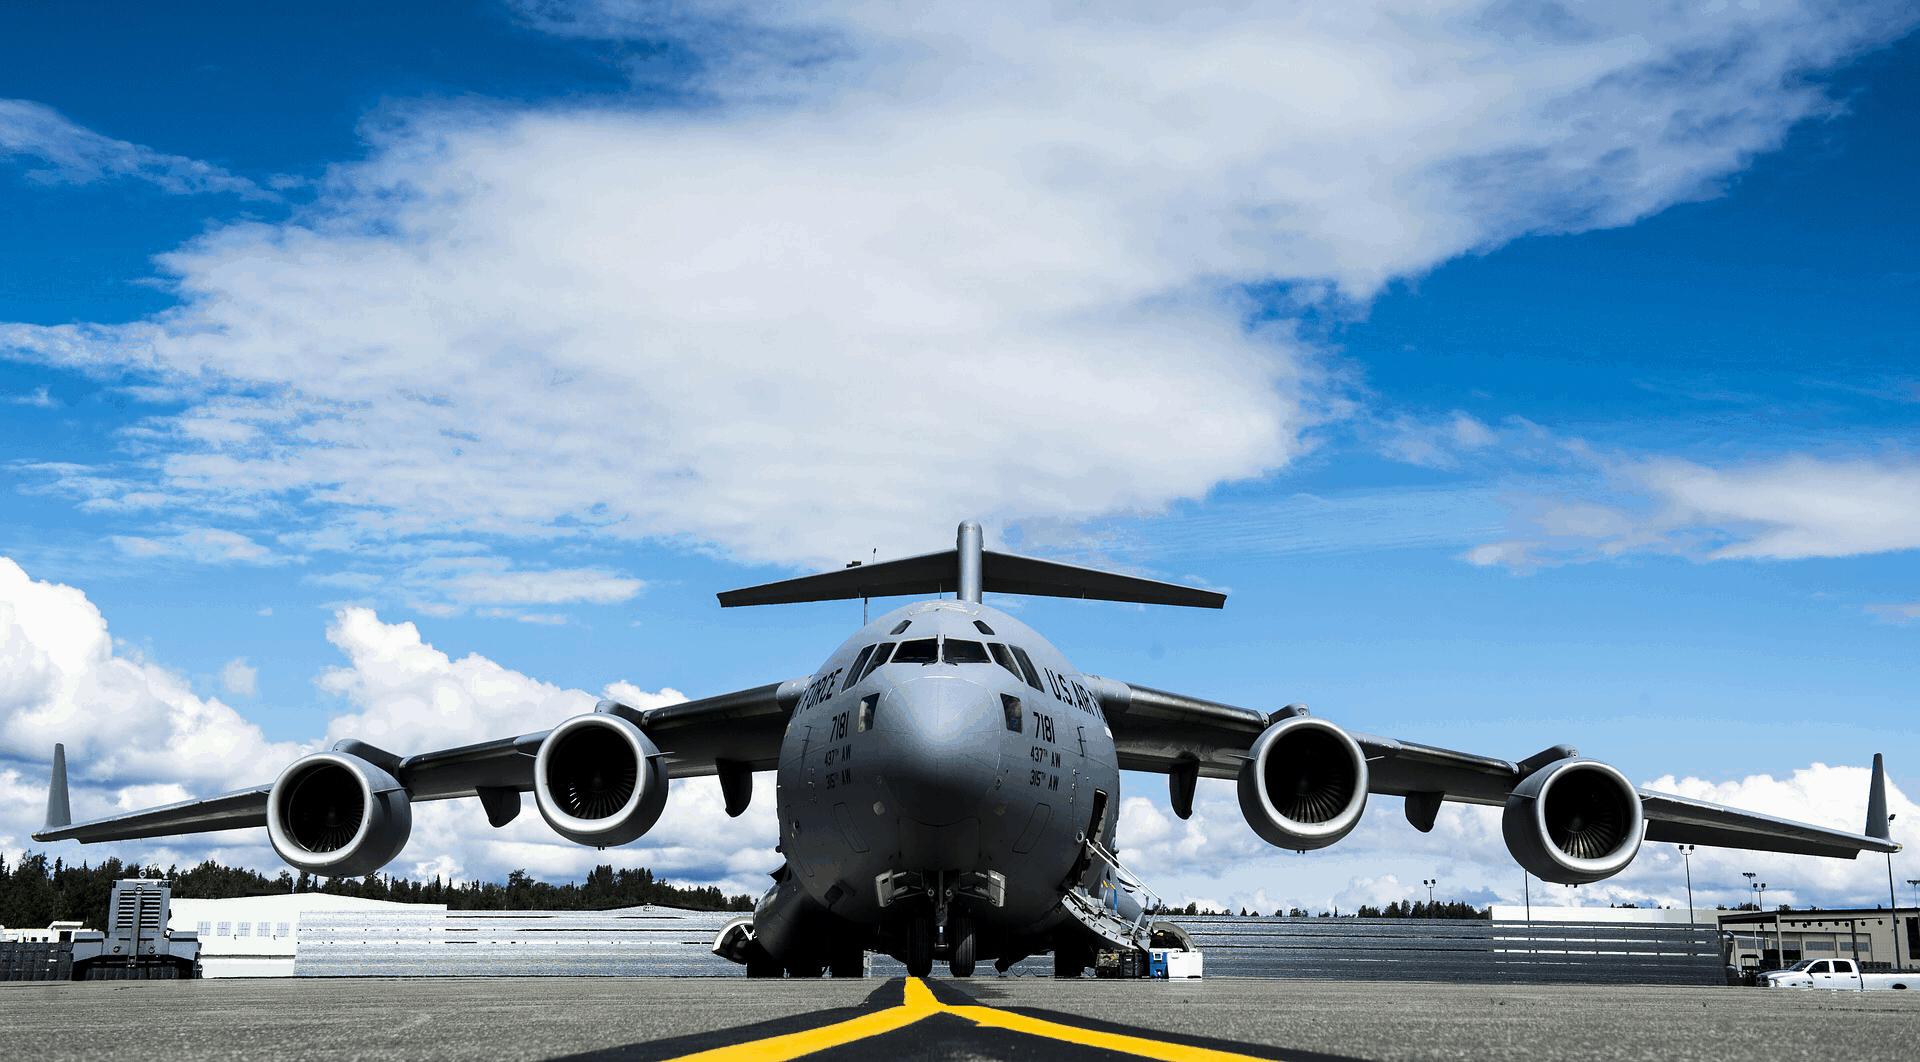 Air Freight From China to USA,Japan,Eu,Canada,Australia